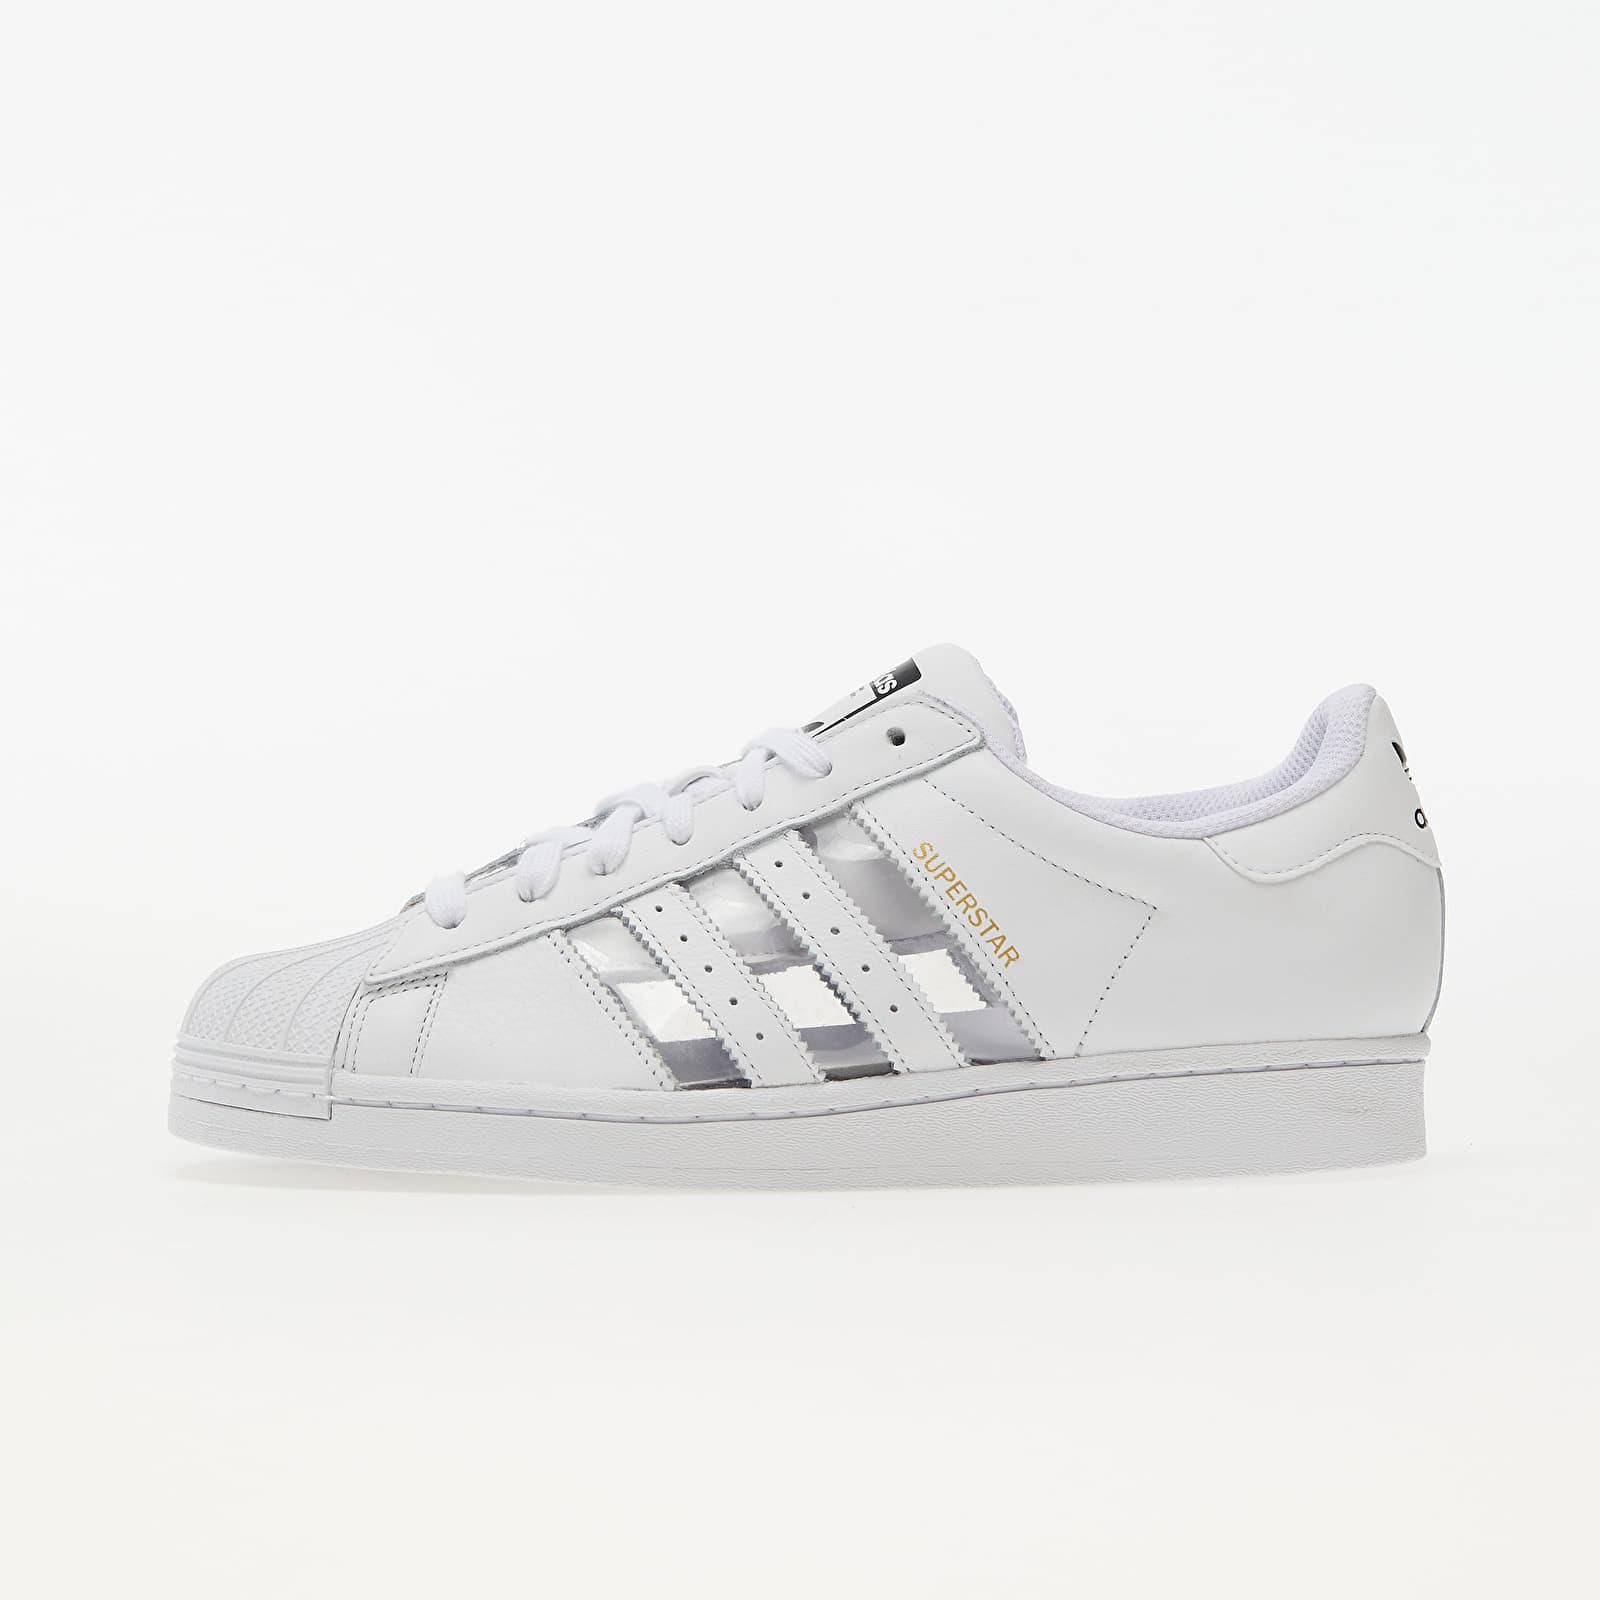 adidas Superstar Ftw White/ Supplier Color/ Core Black EUR 41 1/3